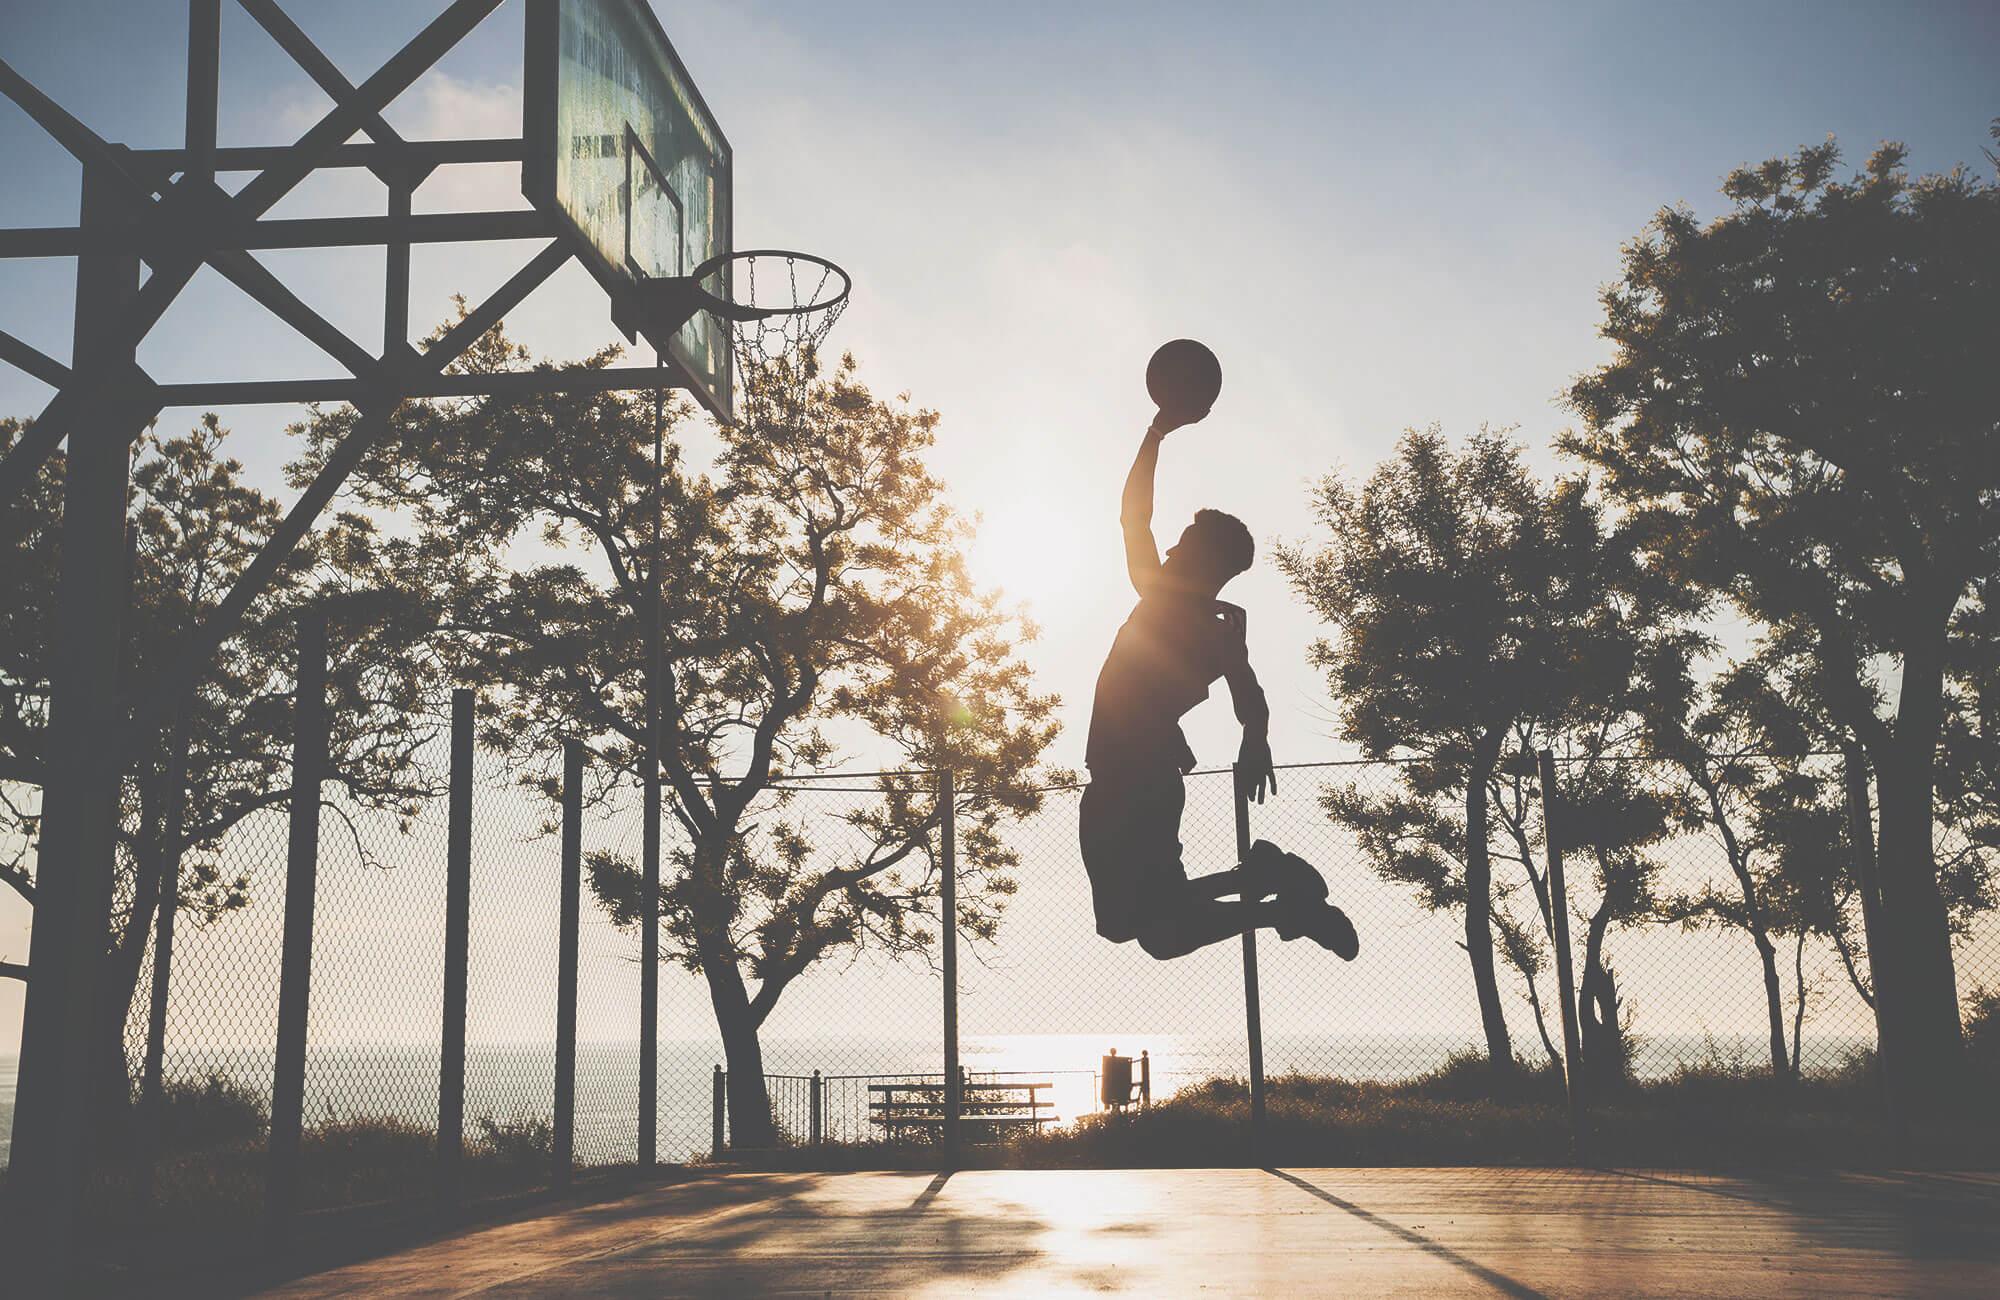 Basketballer Jumping